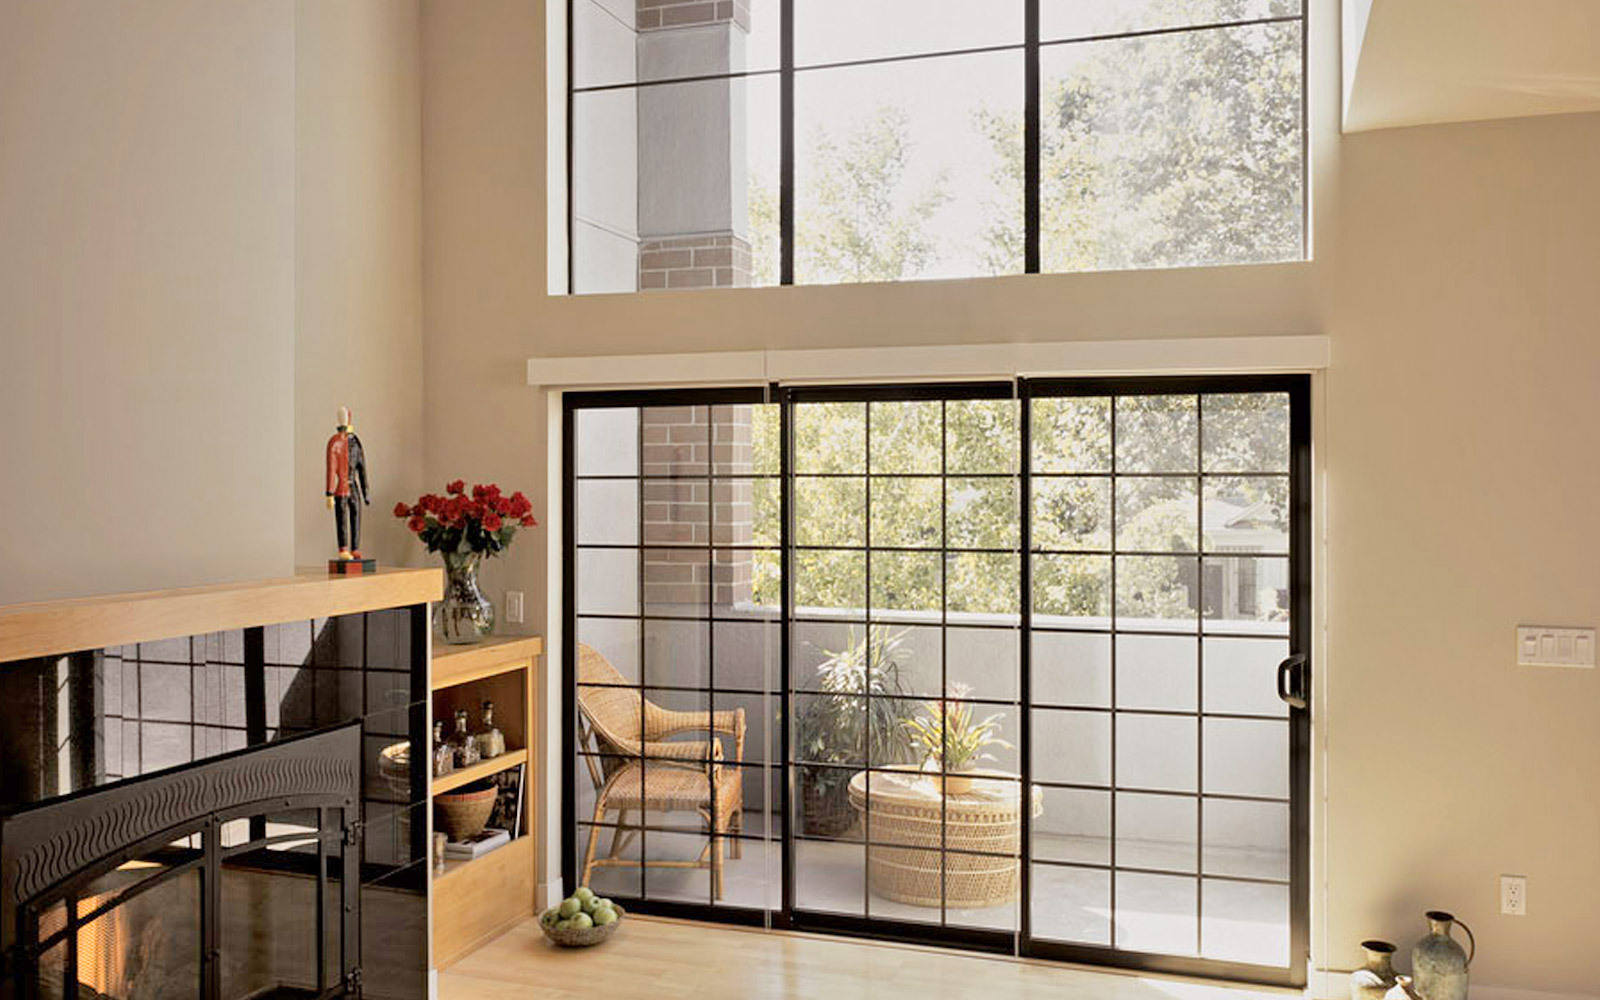 gallery--1600x1000--window-aluminum-1.jpg